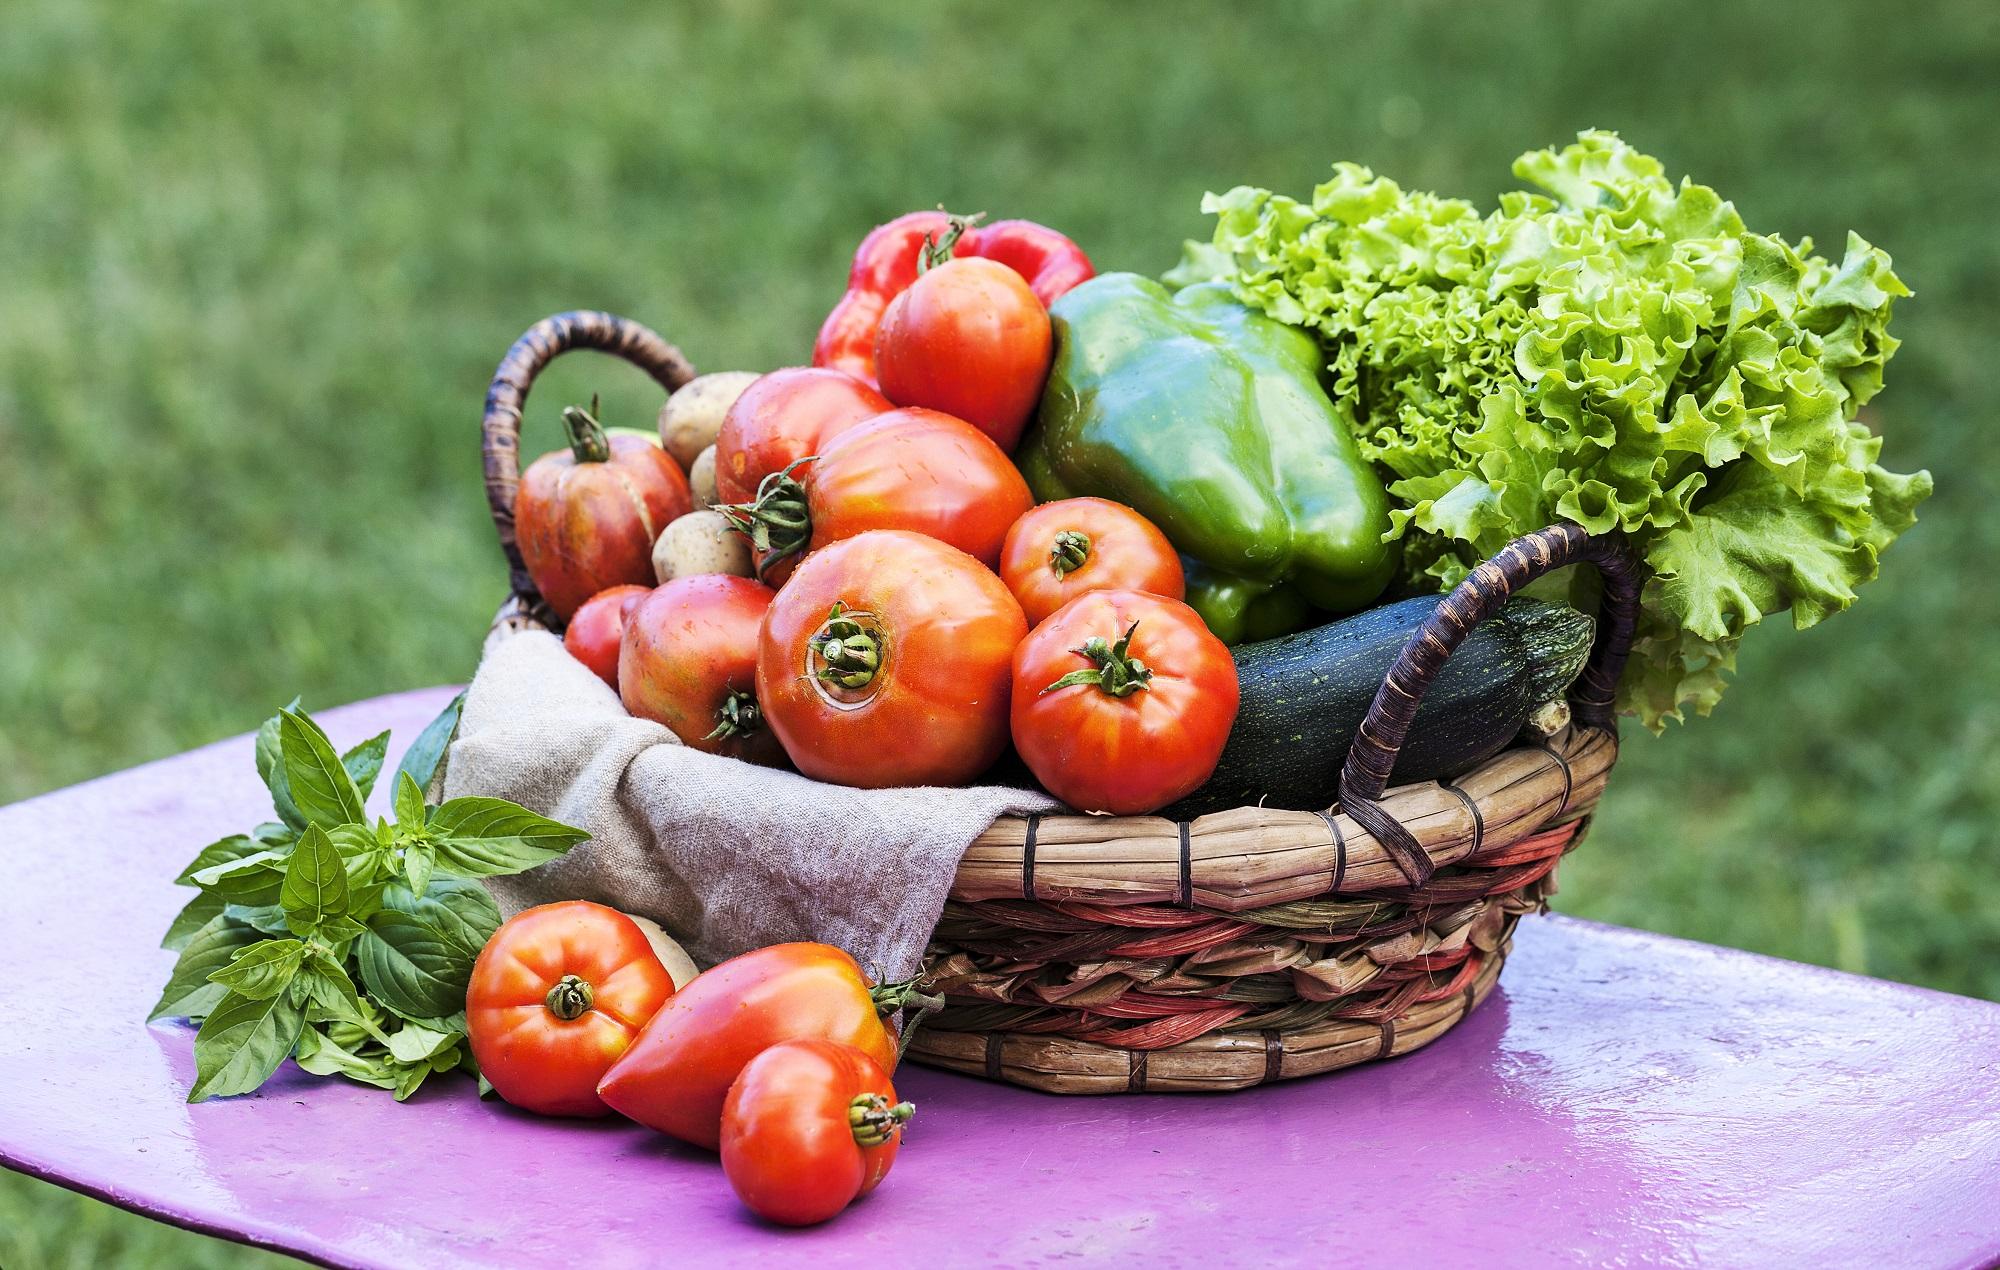 Календарь садовода и огородника на август. Источник фото: Shutterstock